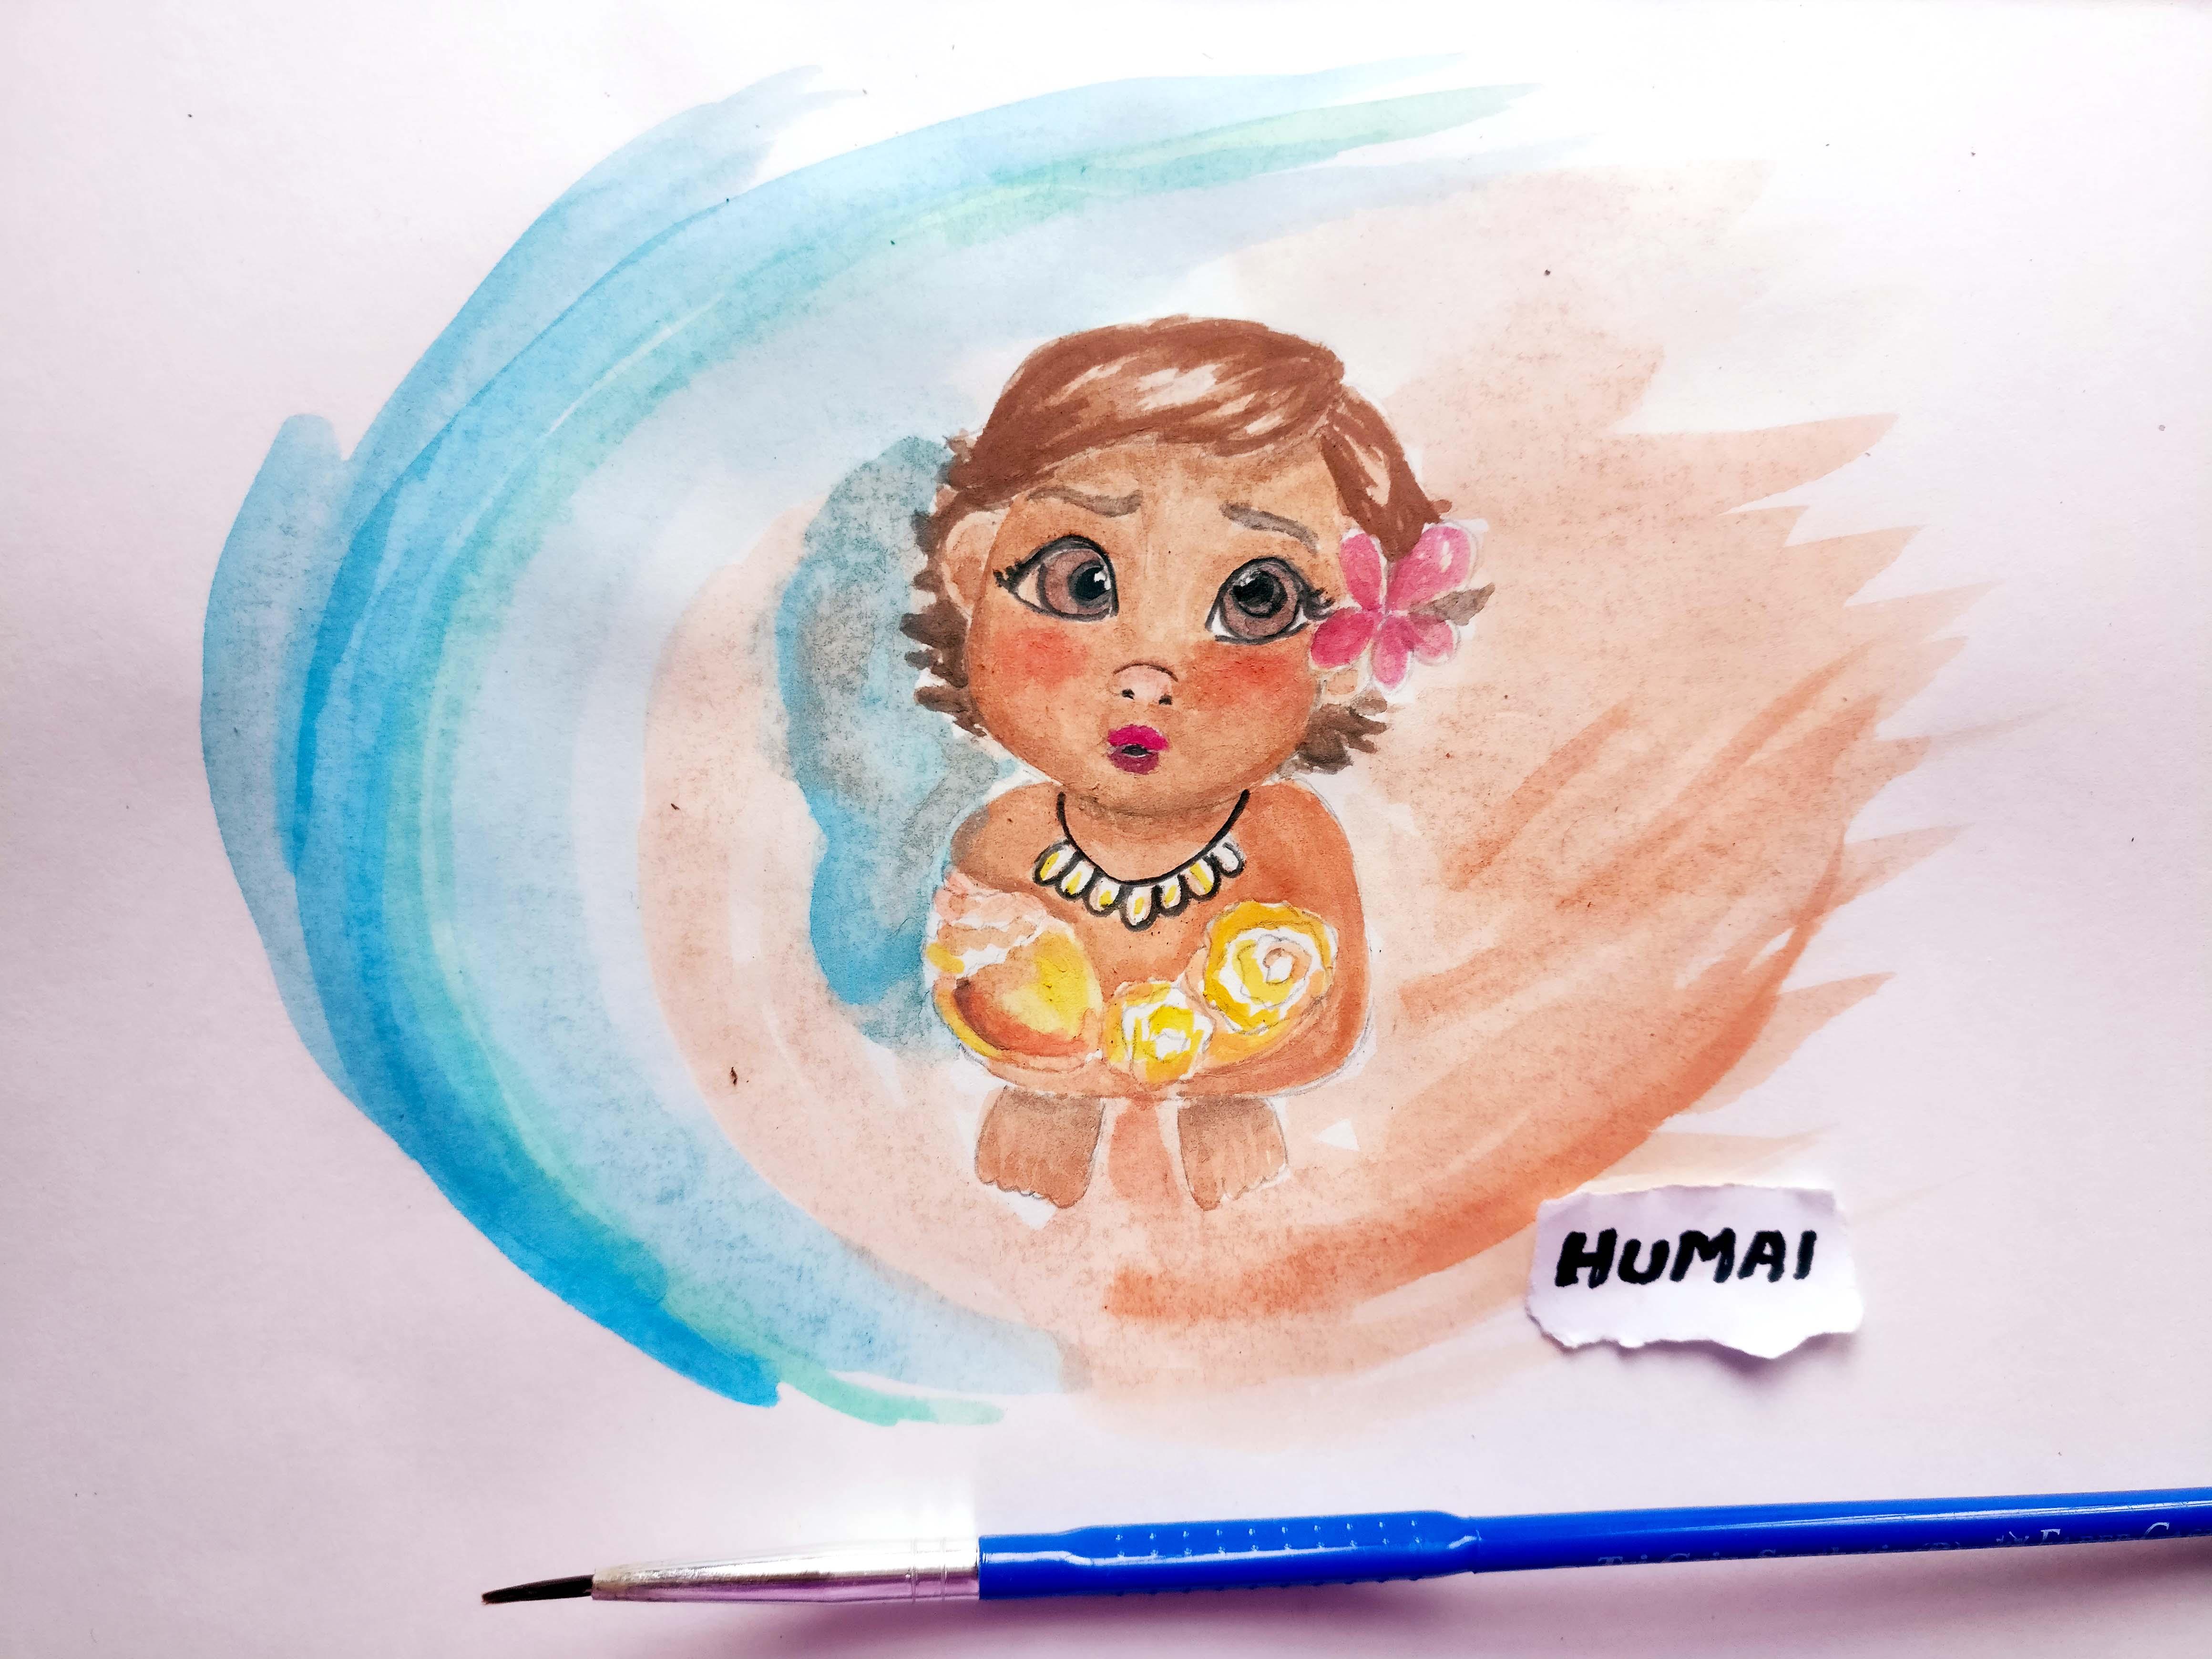 4640x3480 Painting Baby Moana With My Nephew Humaipaints